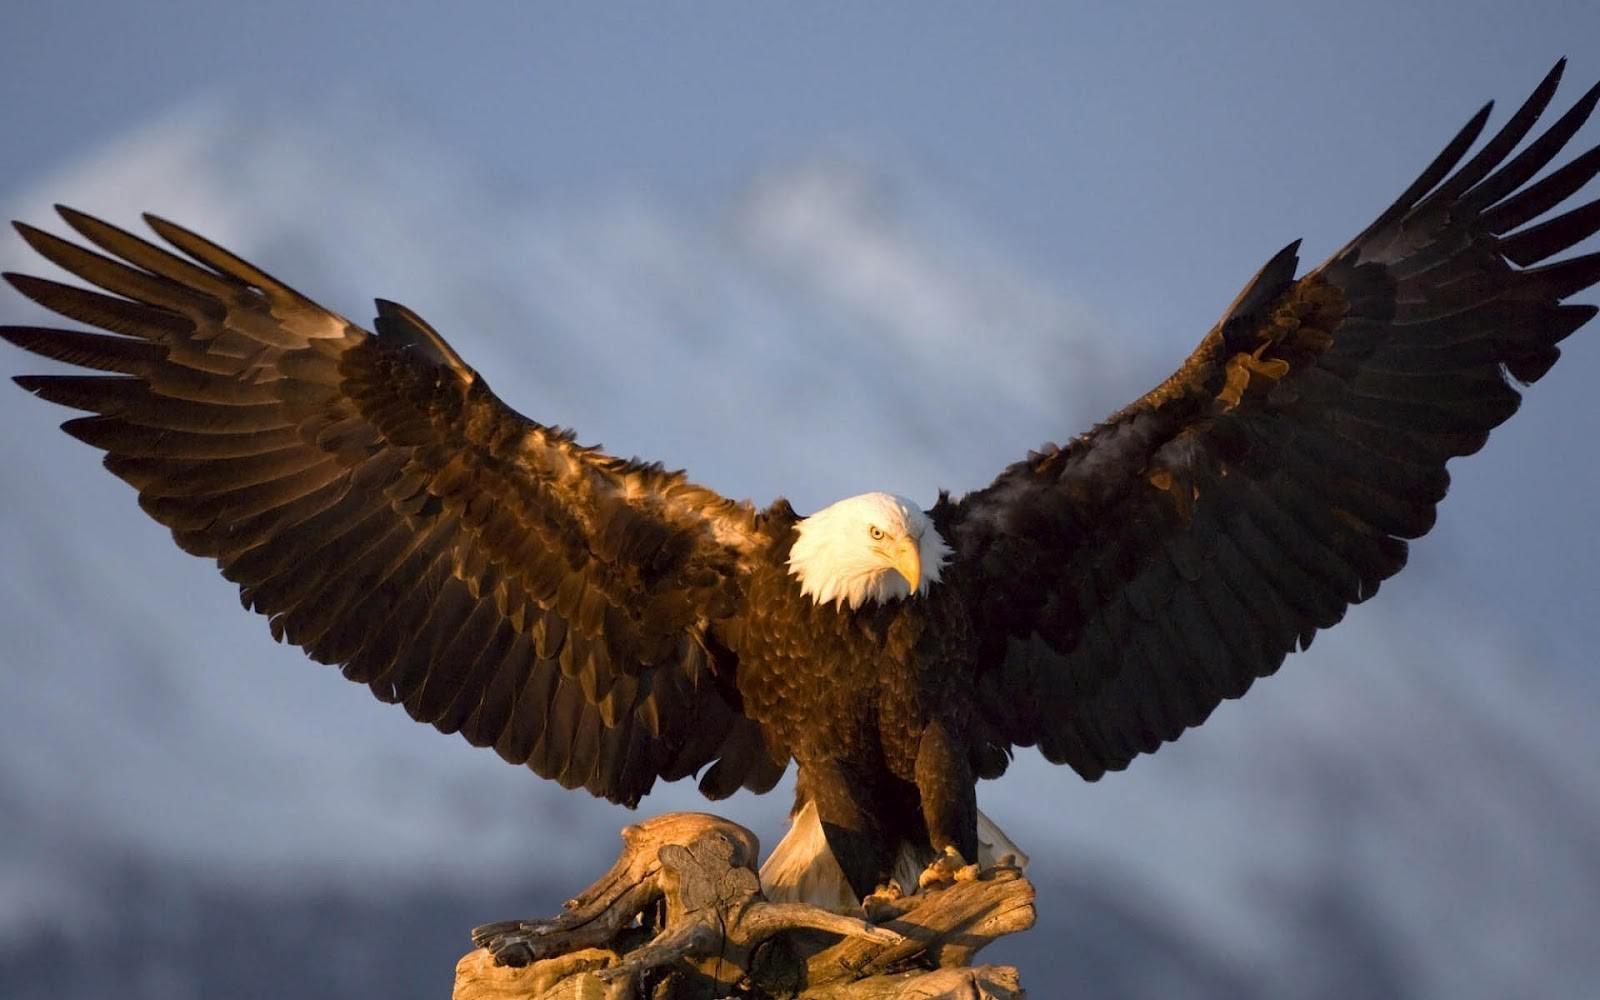 Eagle Spreading Wings Wallpaper